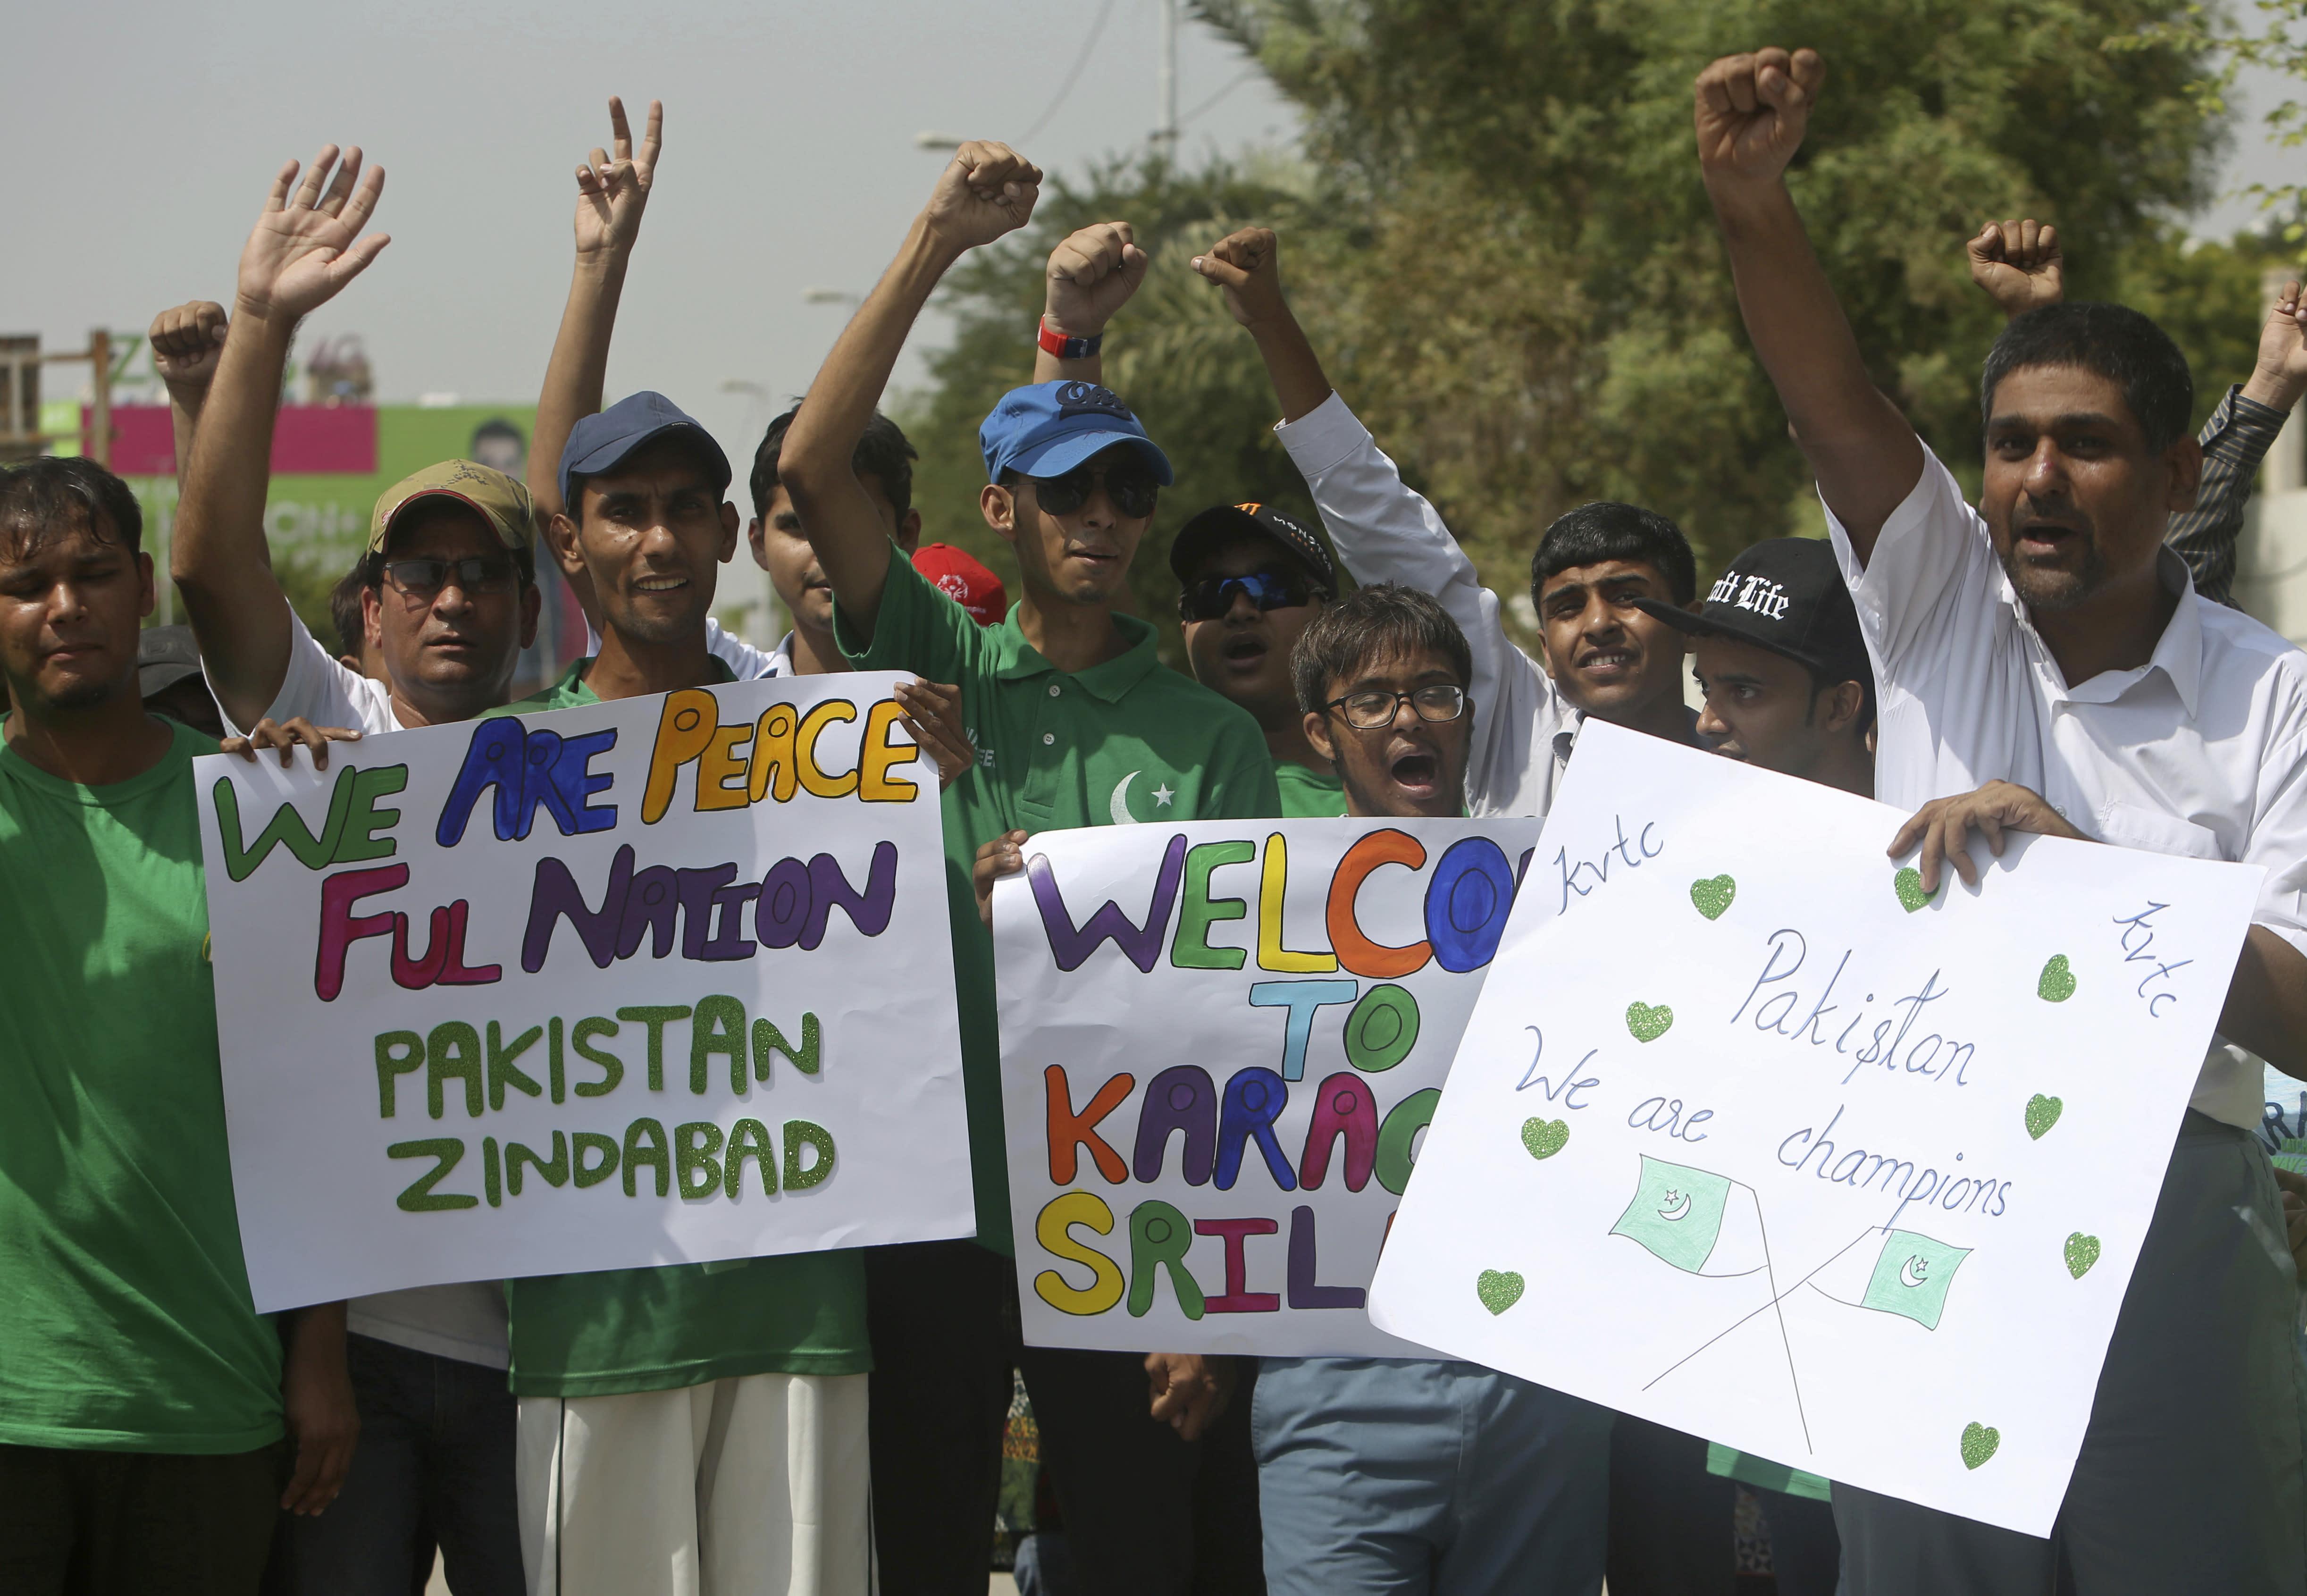 Pakistani cricket fans celebrate the Pakistan--Sri Lanka cricket series outside the National stadium in Karachi, Pakistan, Monday, Sept. 30, 2019. Karachi's 10-year long wait to host a one-day international finally ended on Monday as Pakistan won the toss and elected to bat against Sri Lanka in the second ODI. (AP Photo/Fareed Khan)